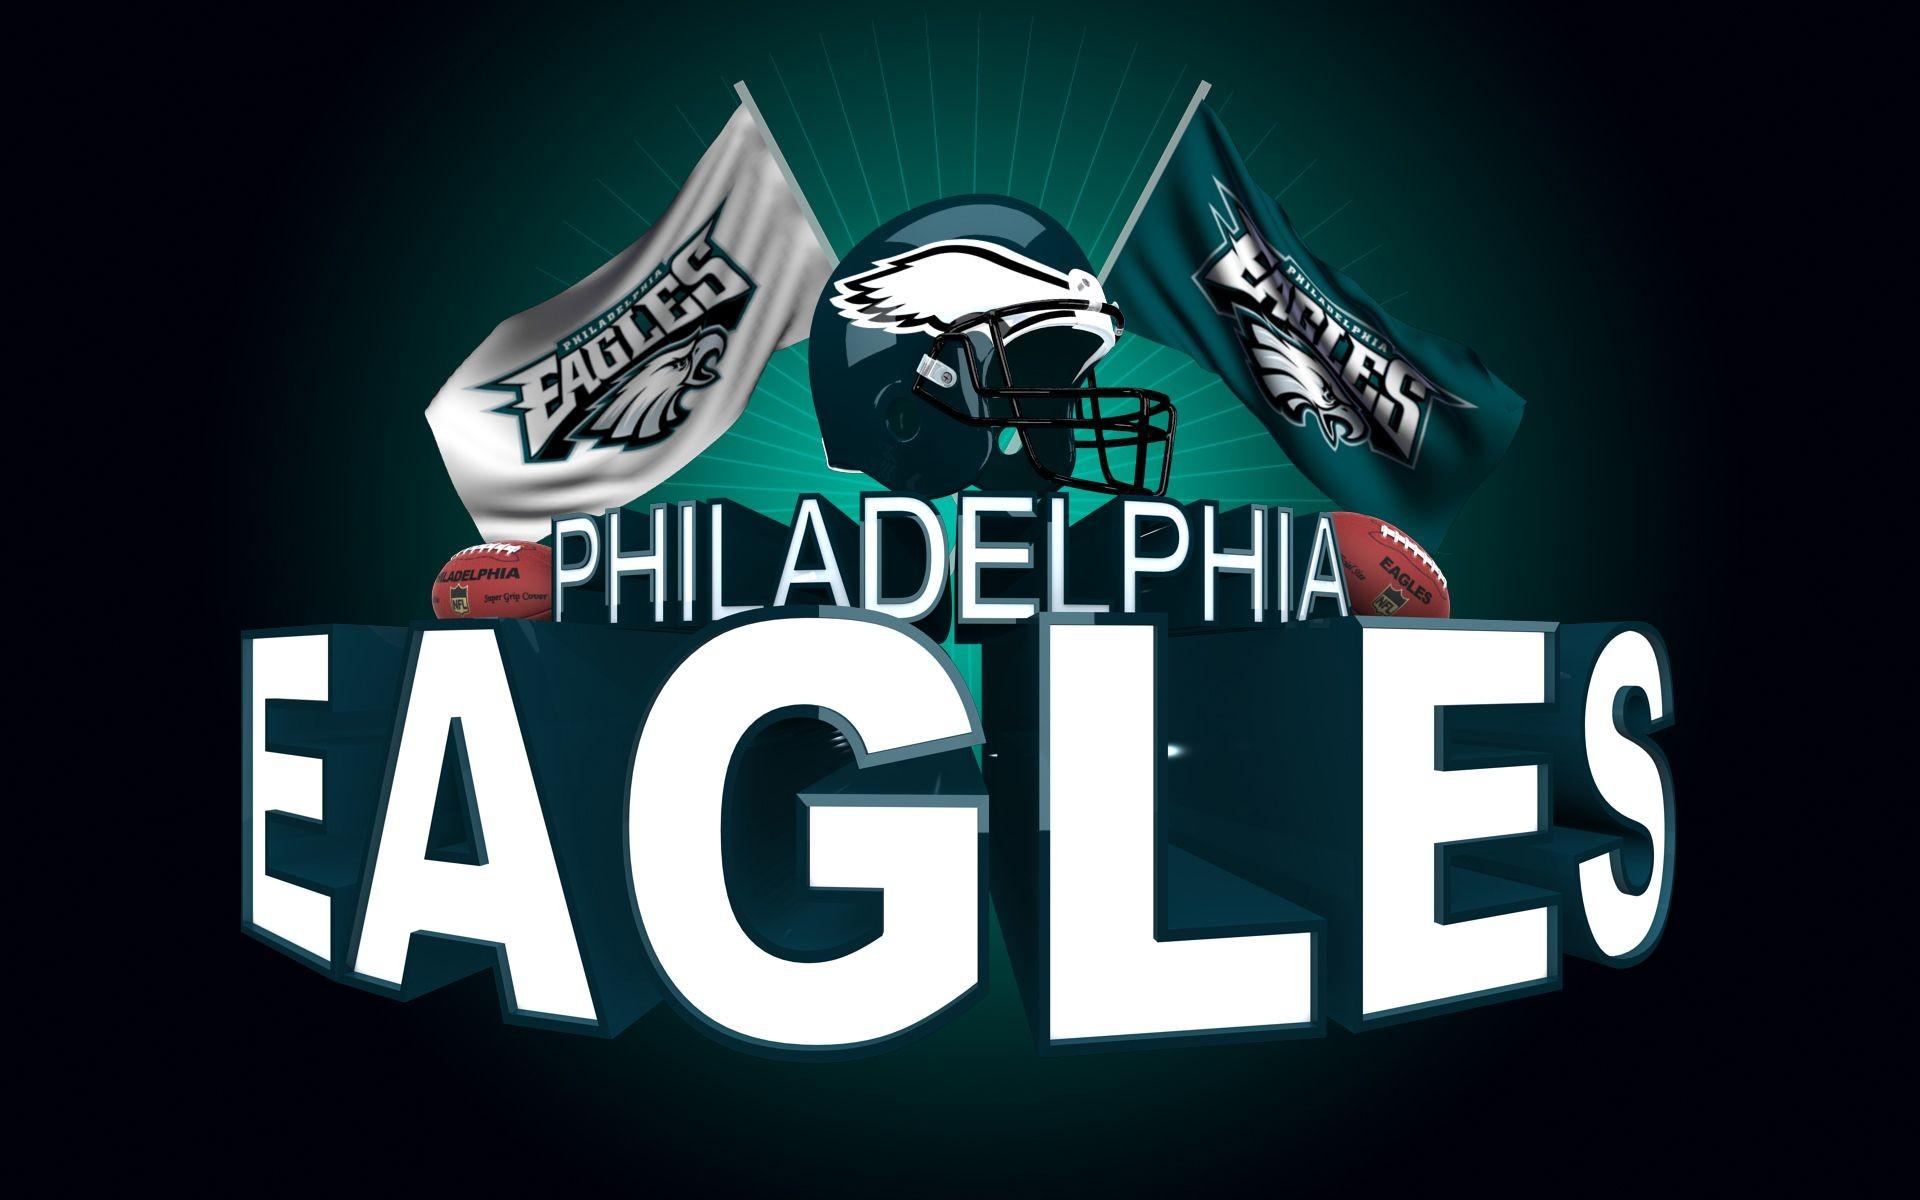 1920x1200 Free Philadelphia Eagles Wallpapers 39 Download